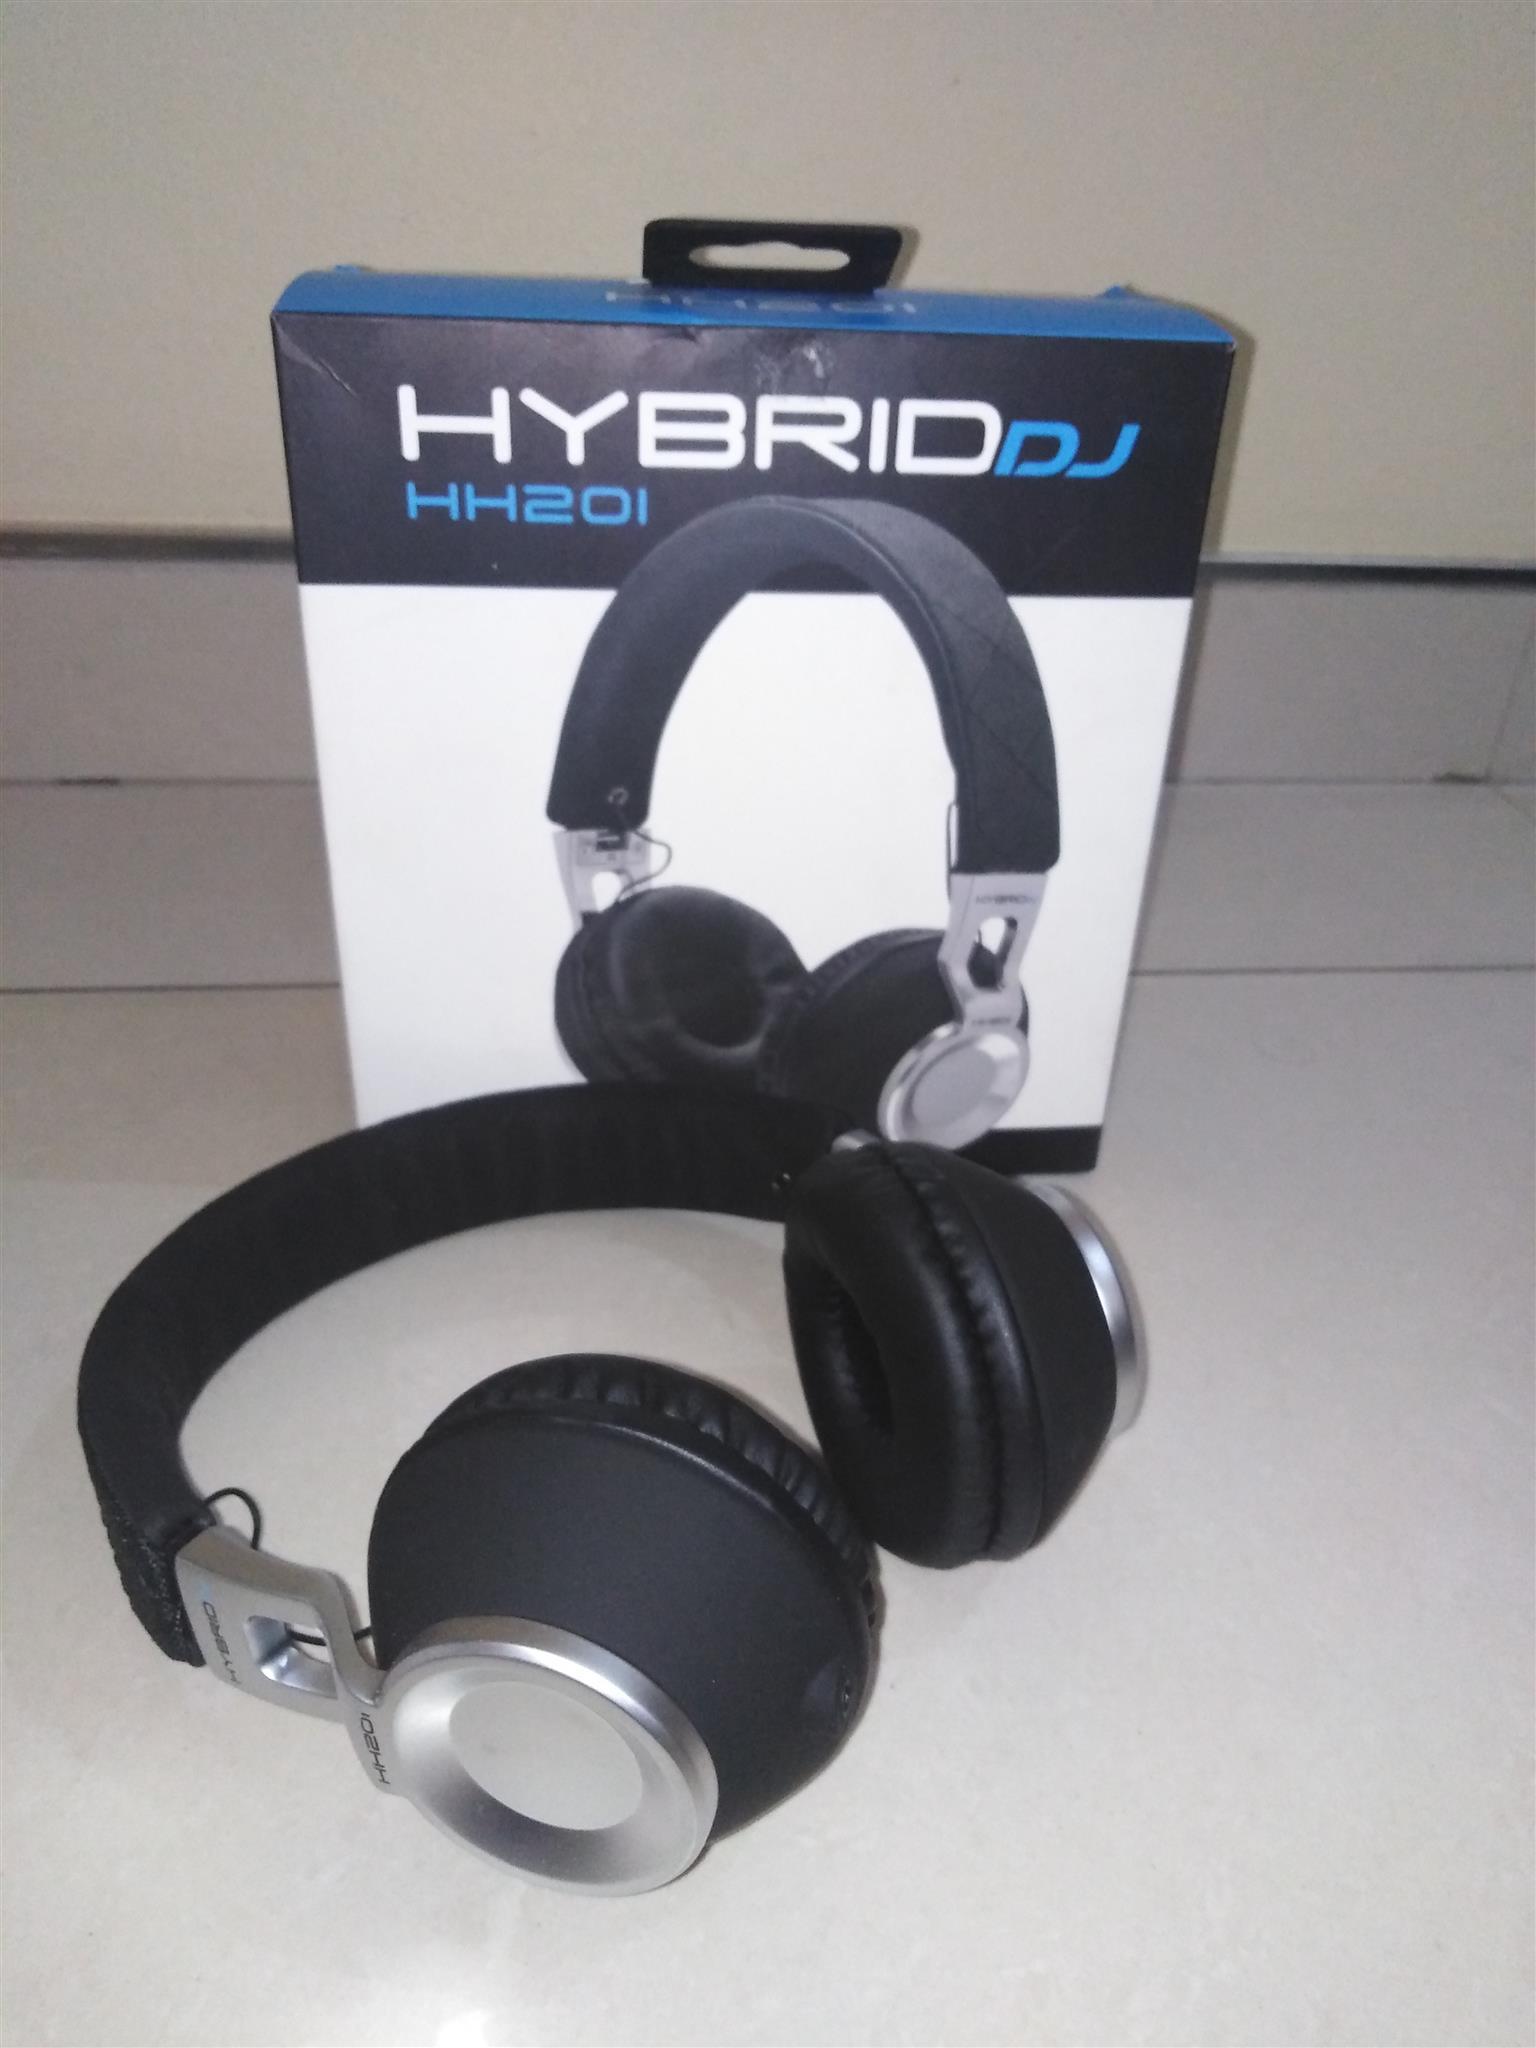 Hybrid HH201 Wired Headphones